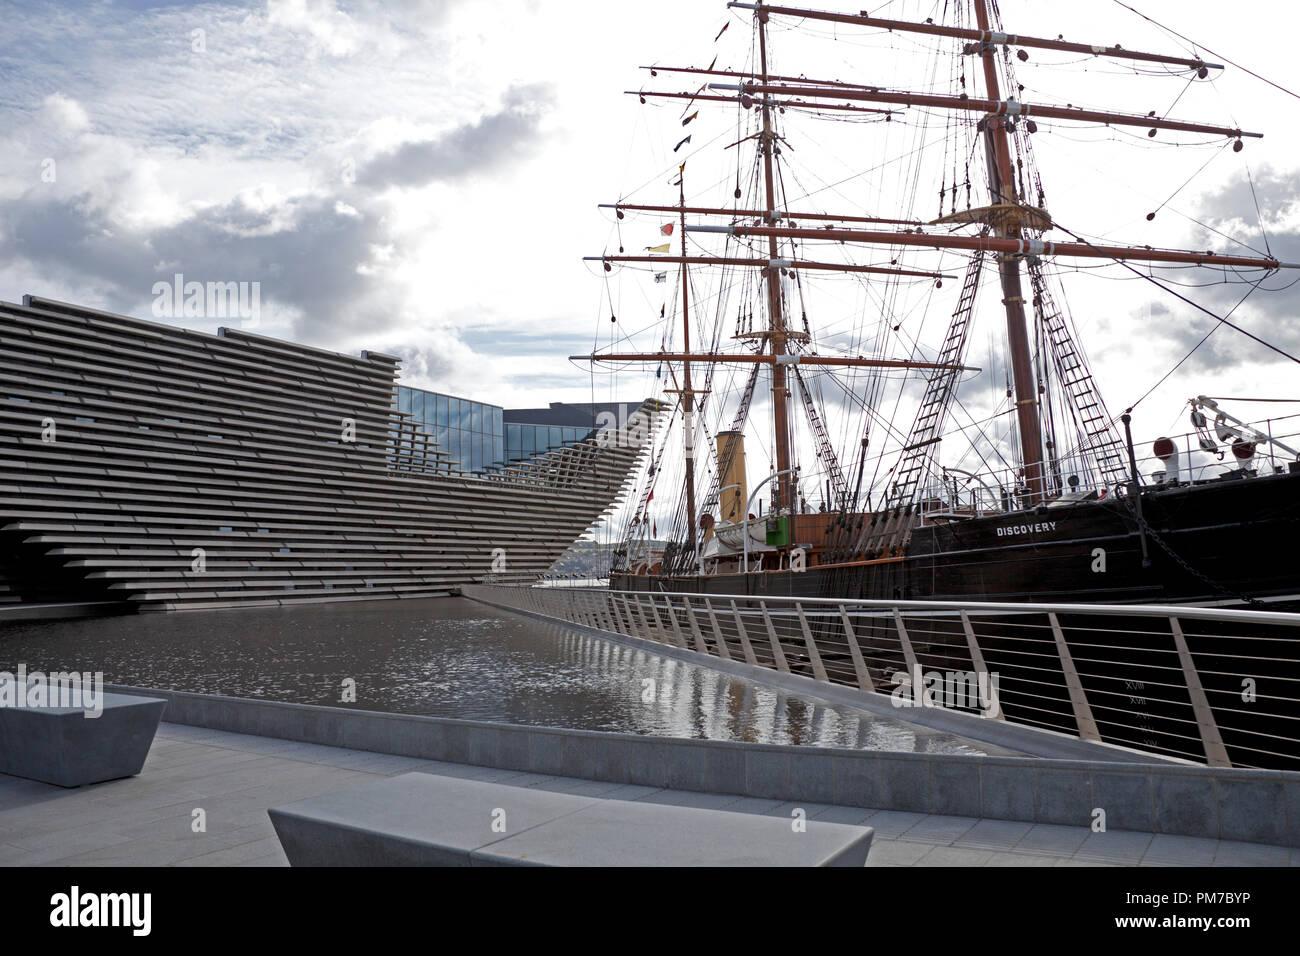 V&A, design museum, Dundee, Scotland, UK - Stock Image